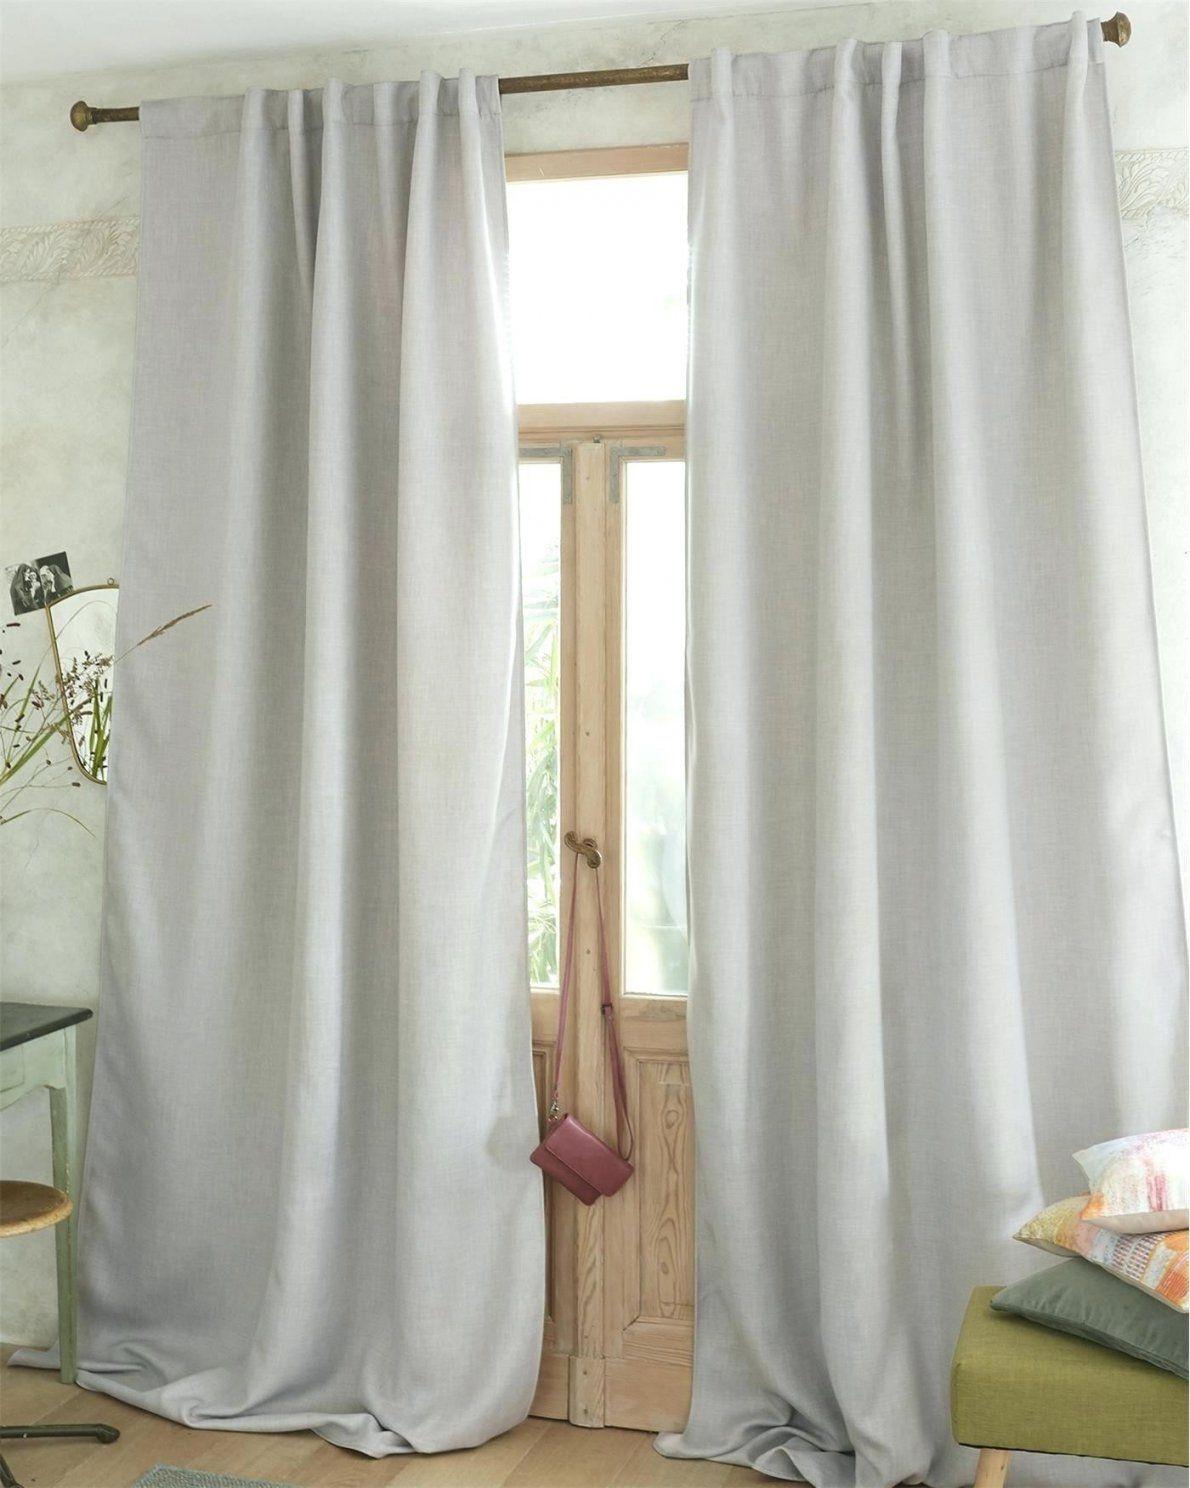 vorhang grau wei gestreift stunning vorhange weiss grau vorhang grau weiss gestreift with. Black Bedroom Furniture Sets. Home Design Ideas